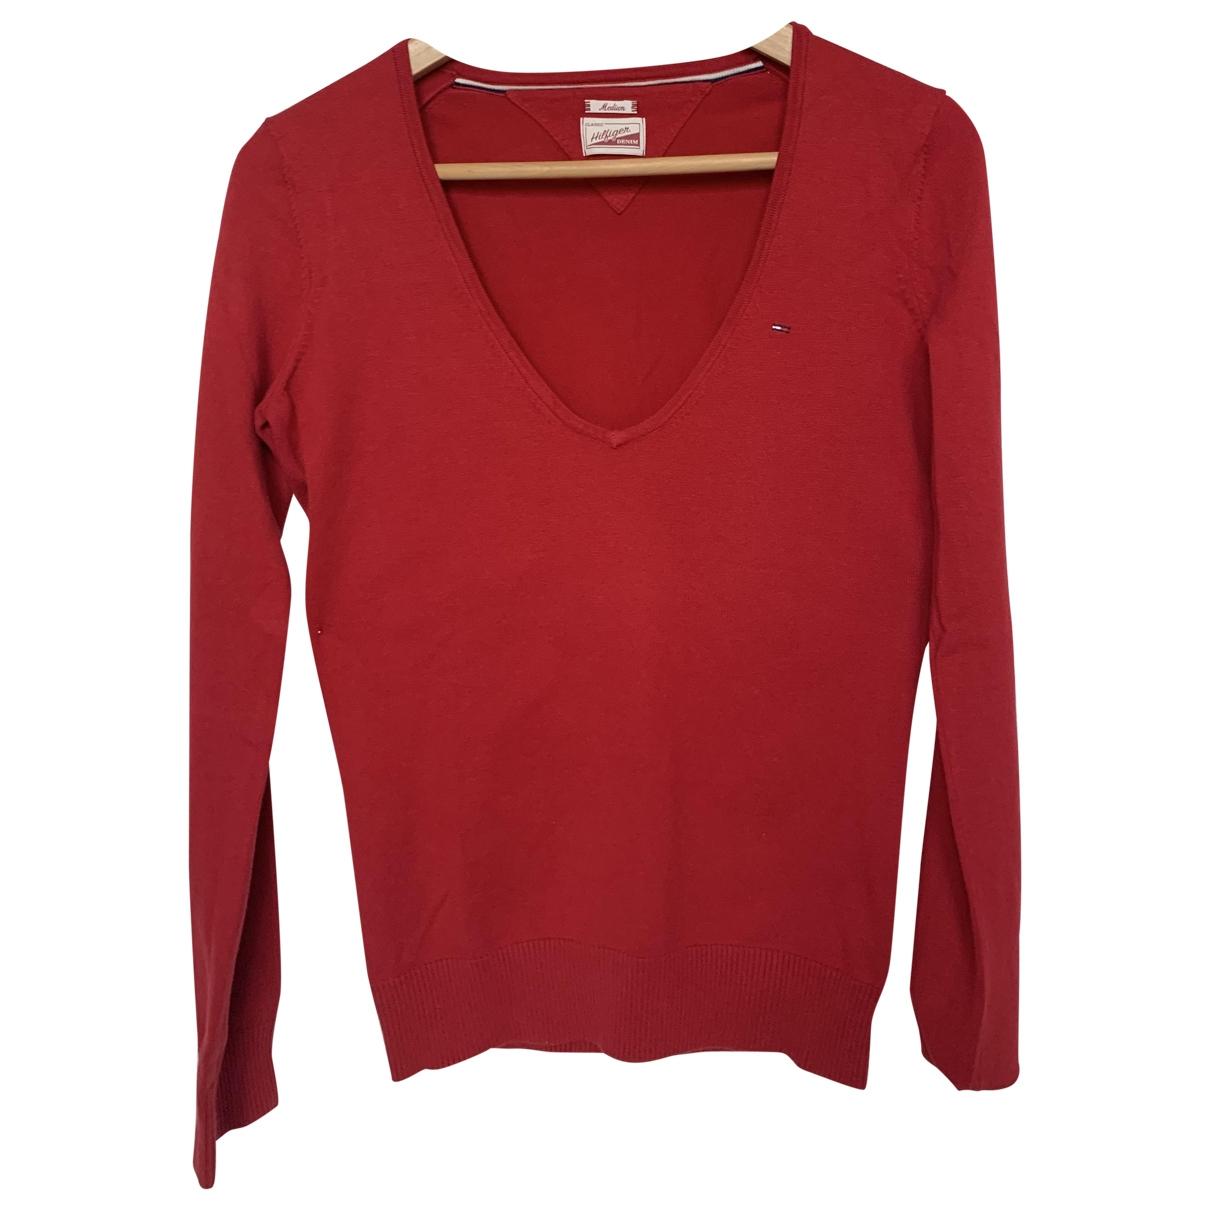 Tommy Hilfiger \N Red Cotton Knitwear for Women M International